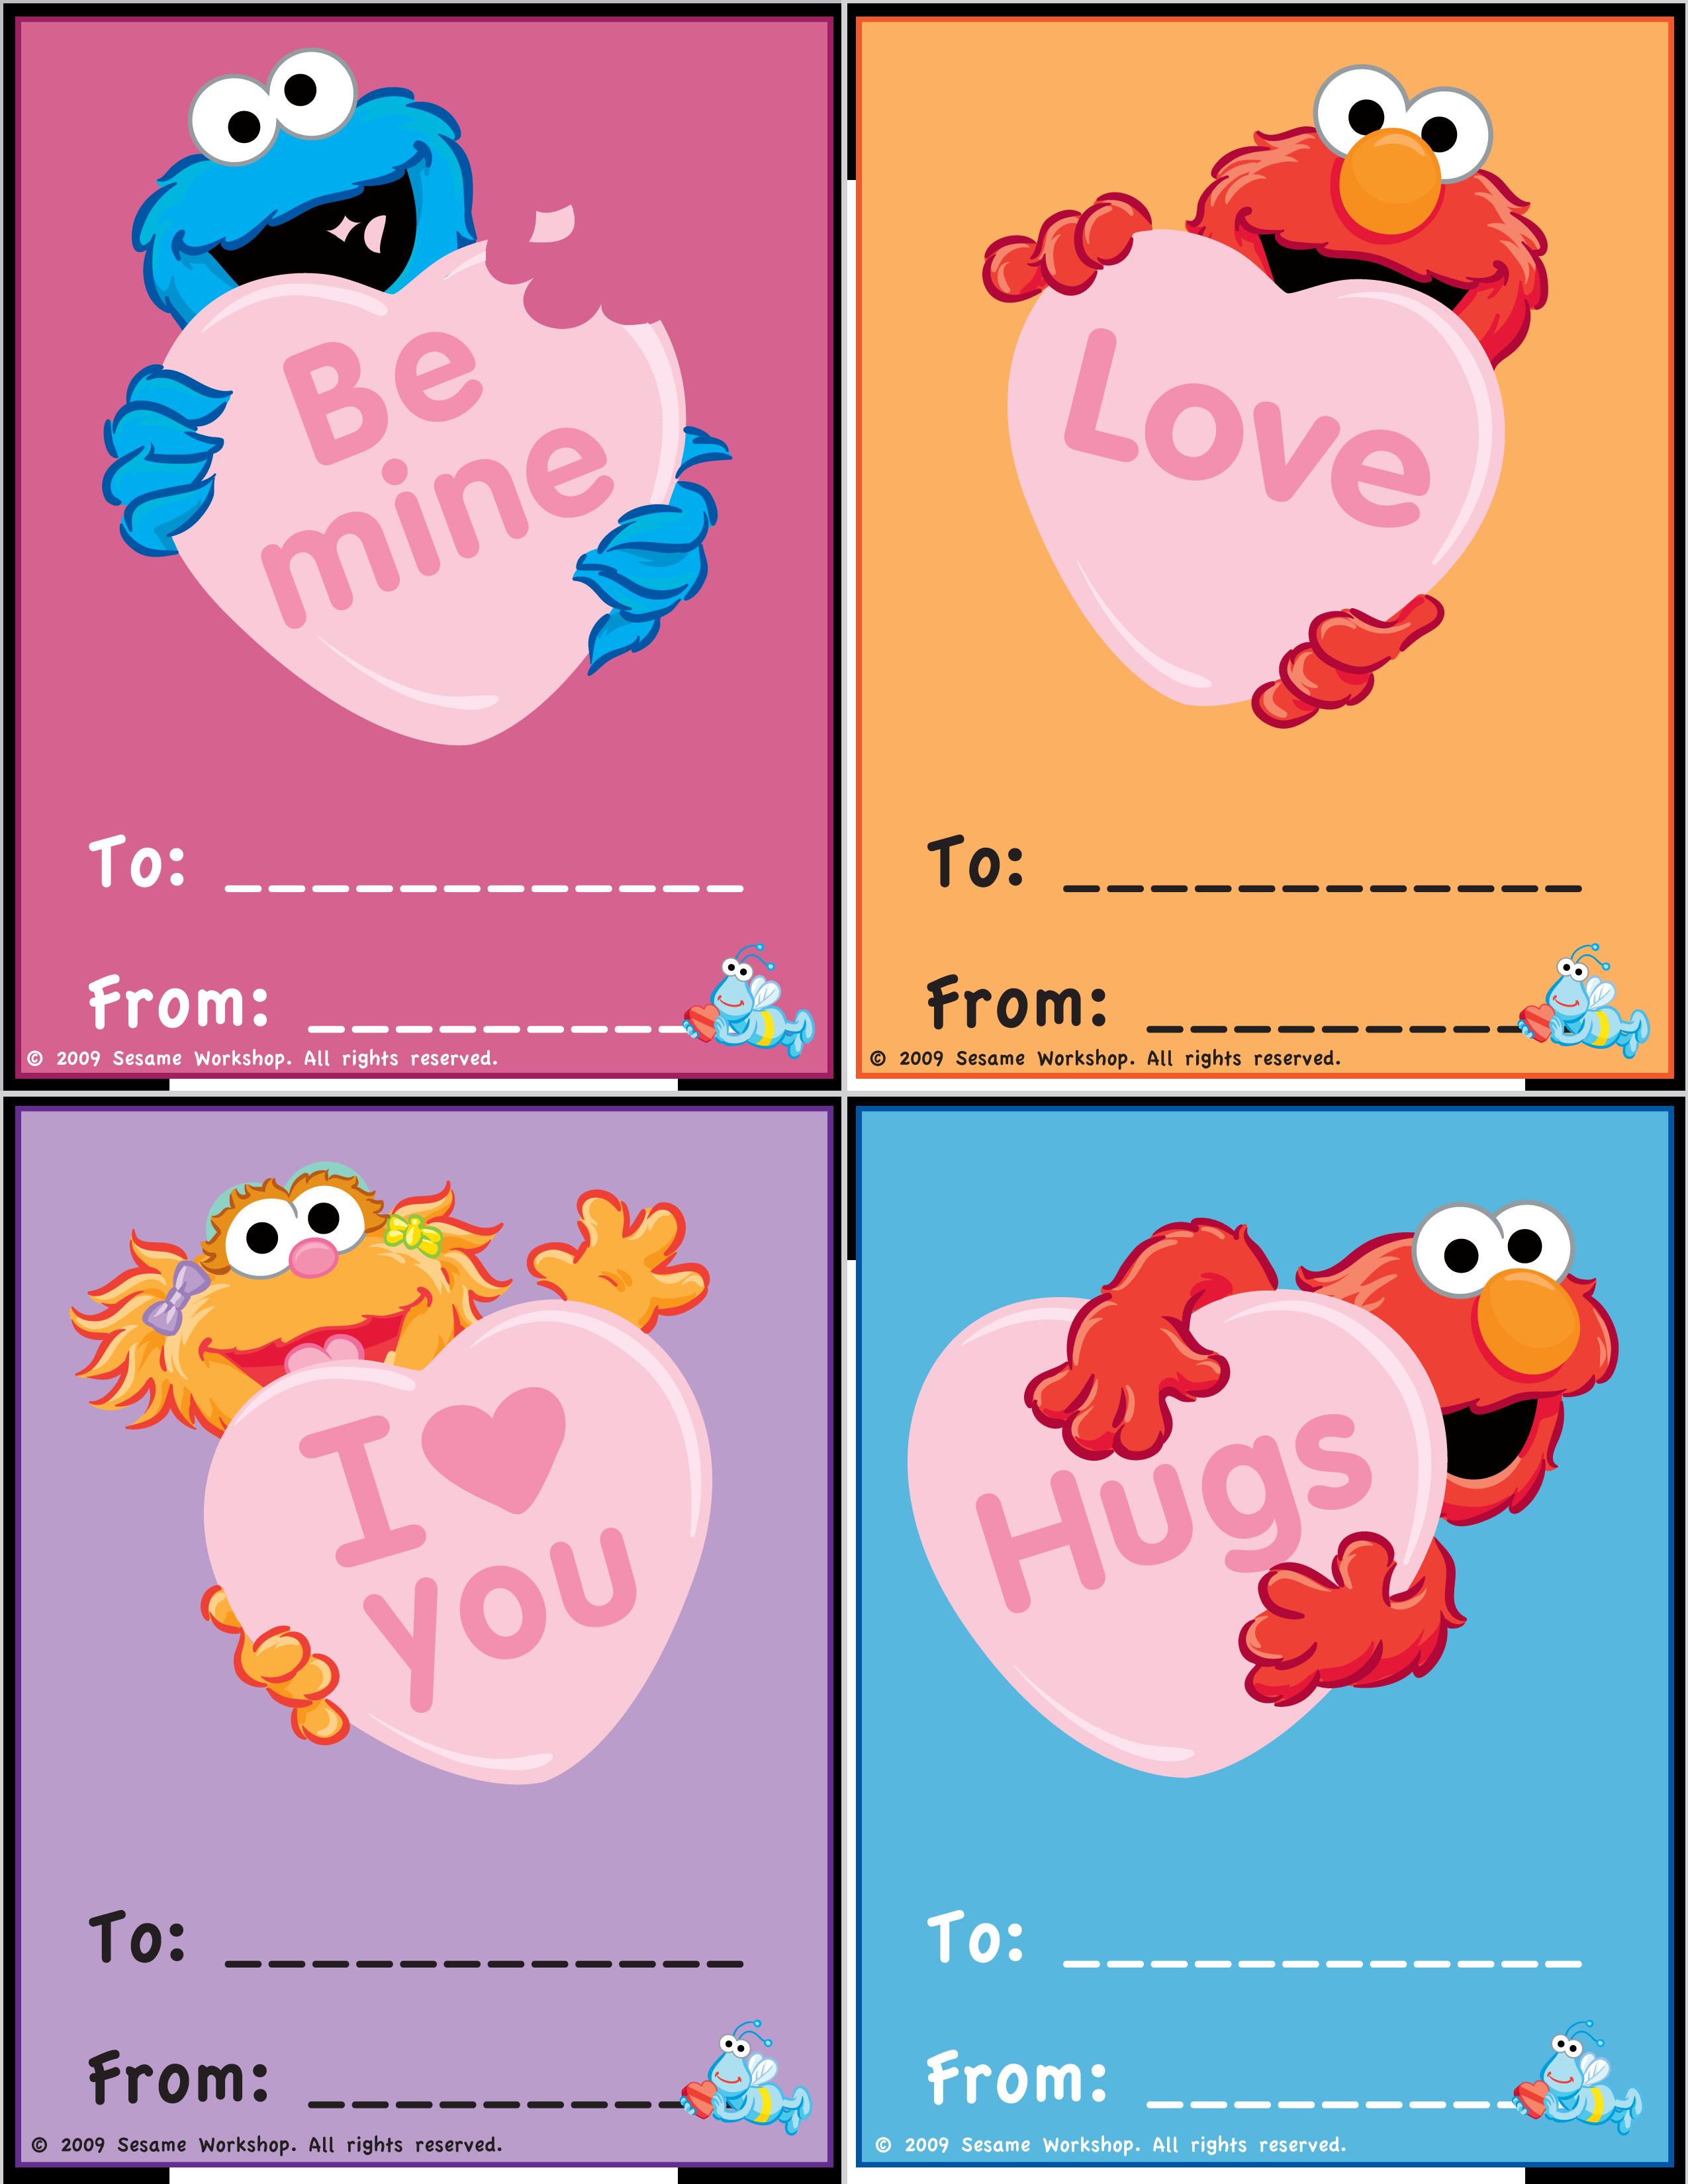 image about Valentines Day Cards Printable titled Artwork Sesame Highway PBSKids